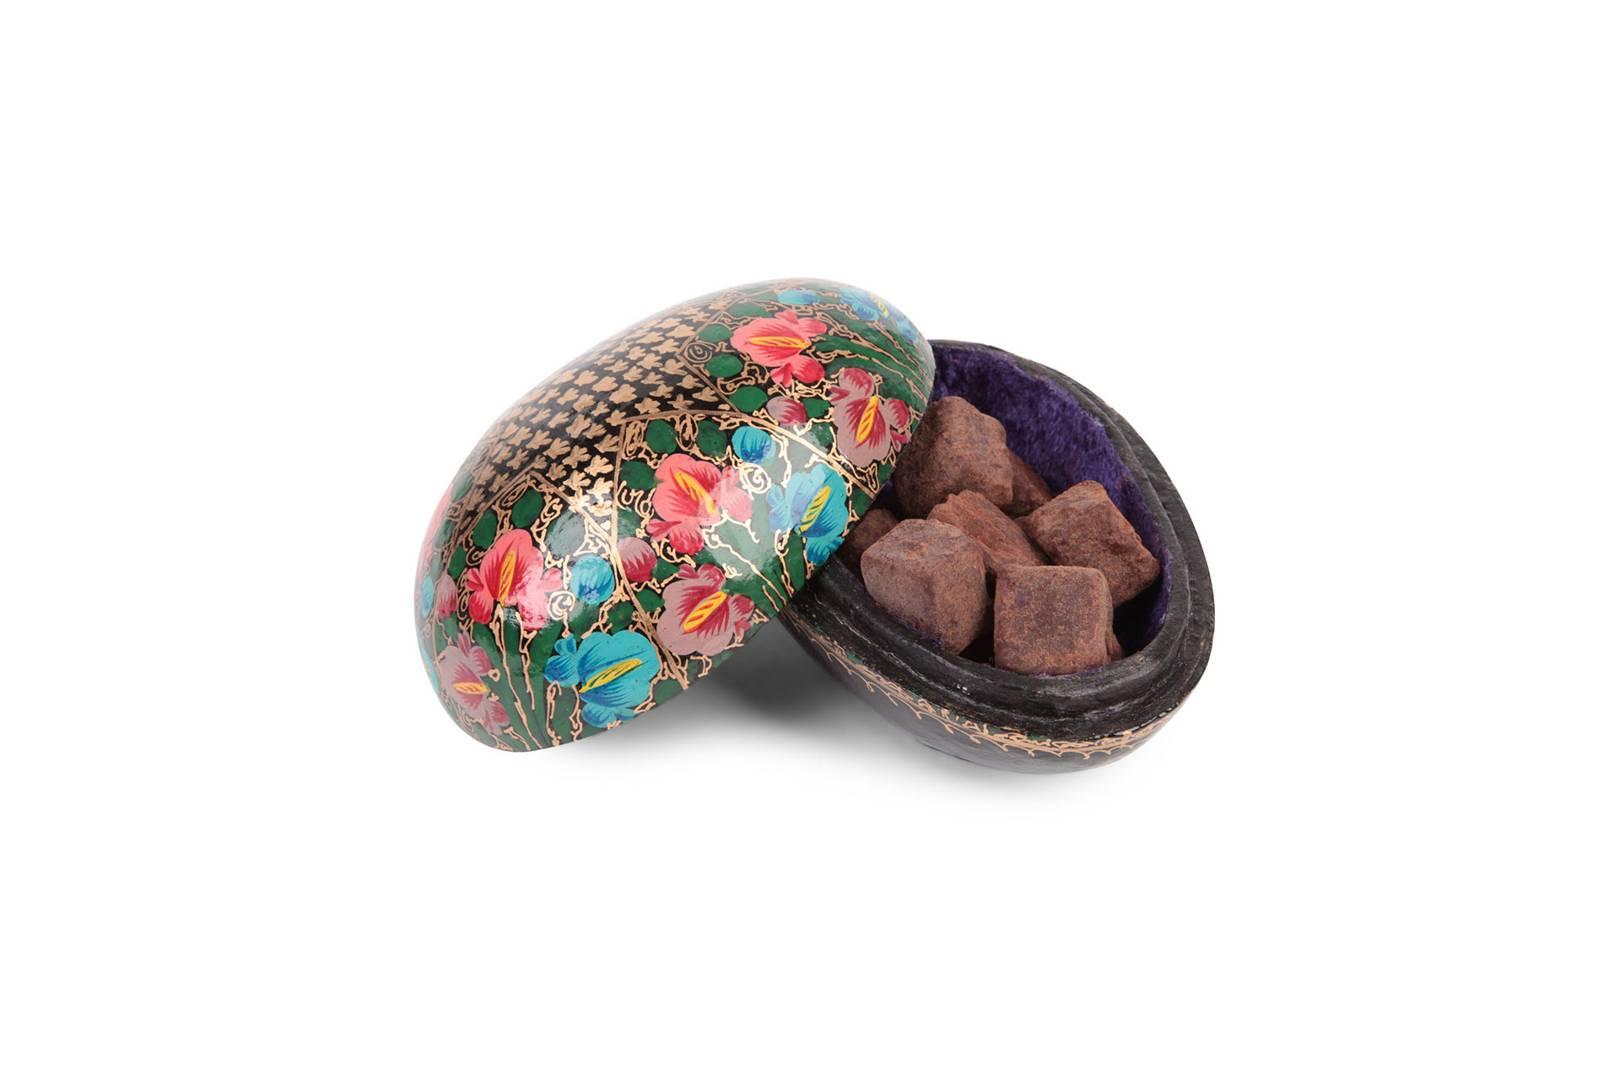 062fe132bb47 The Best Luxury Easter Eggs Of 2019